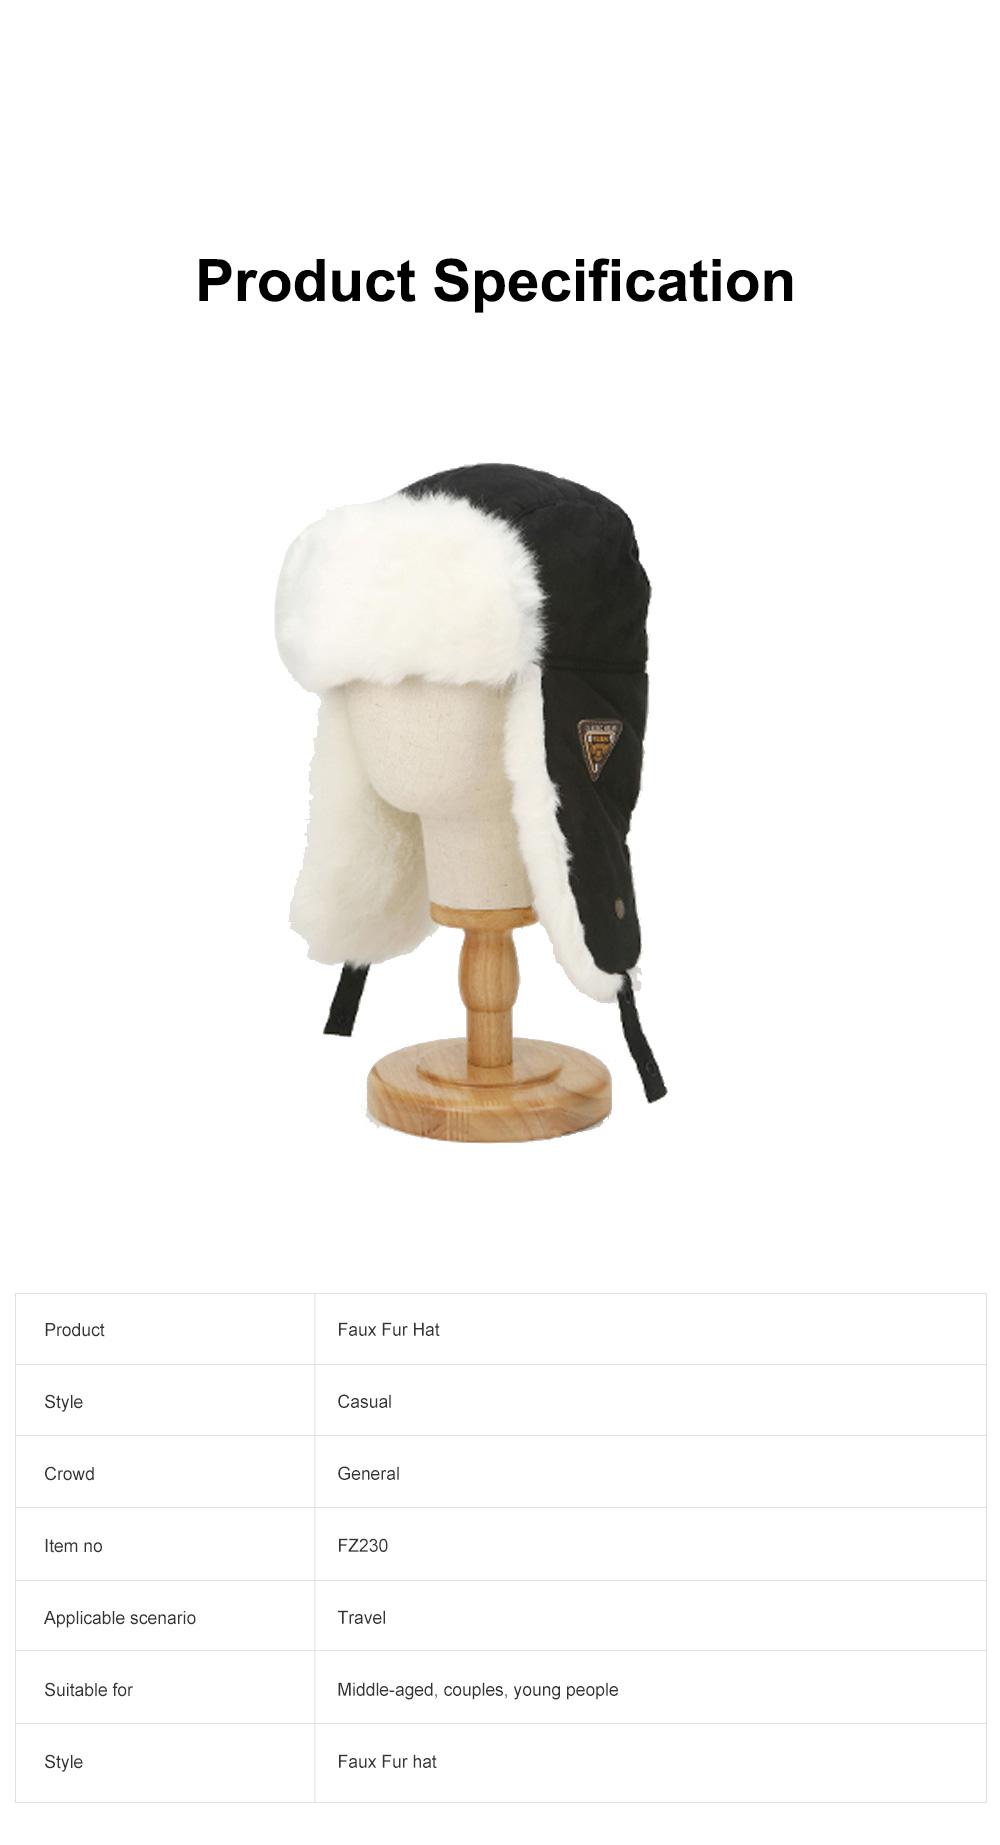 Winter Snow Hat Old Men Thickening Plus Velvet Warm Cap Plush Animal Cap Russian Style Faux Fur Hat With Ear Flaps Ski Earmuffs 6